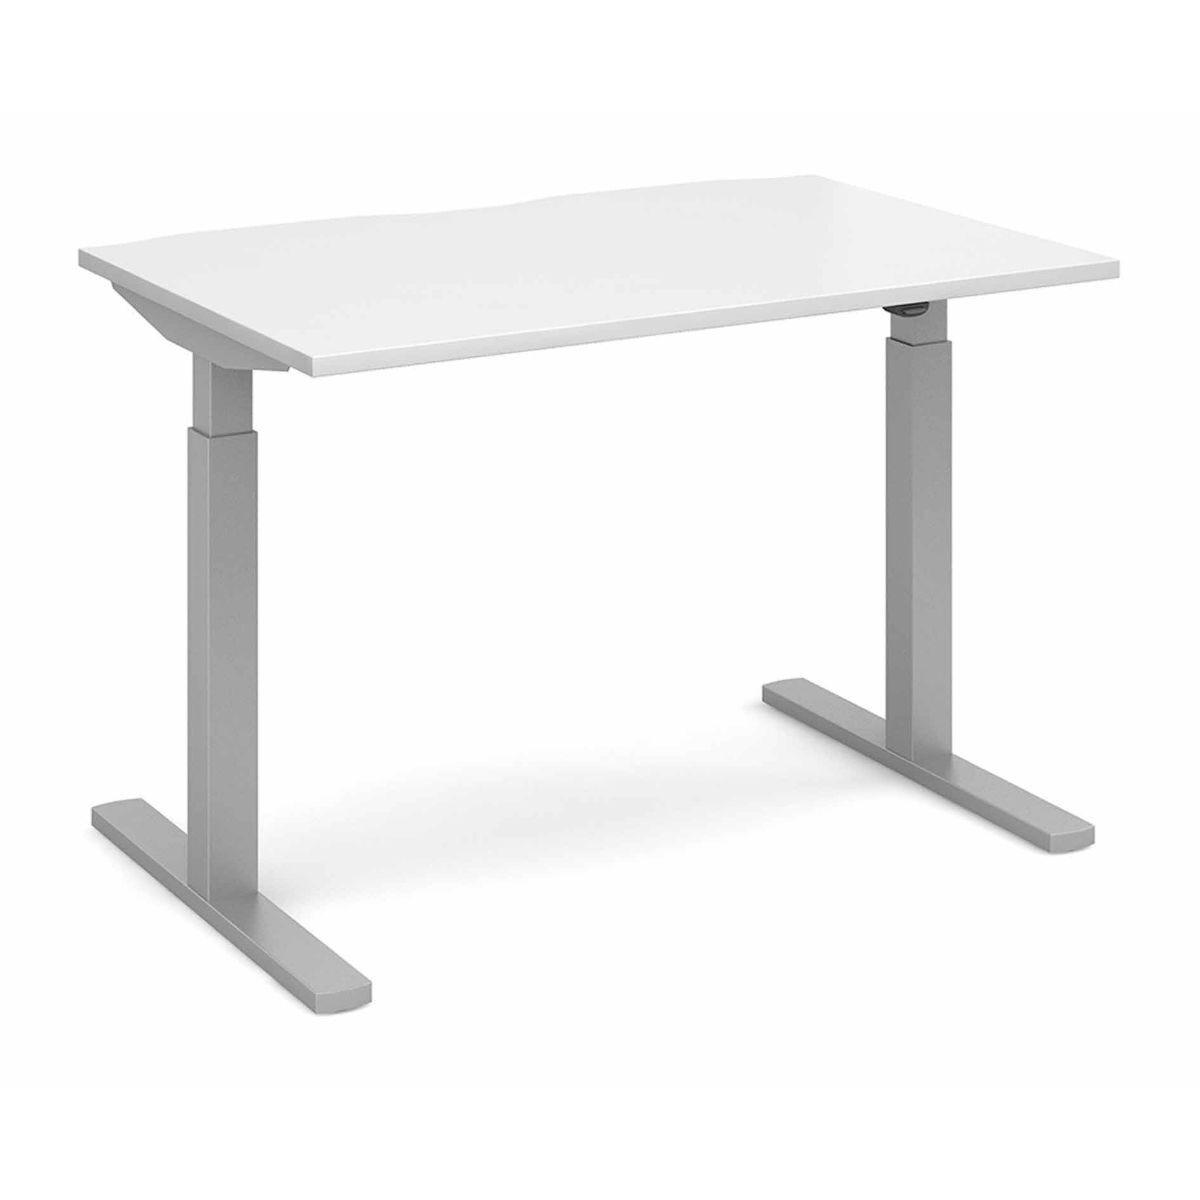 Elev8 Mono Straight Sit Stand Desk 1200mm x 800mm white